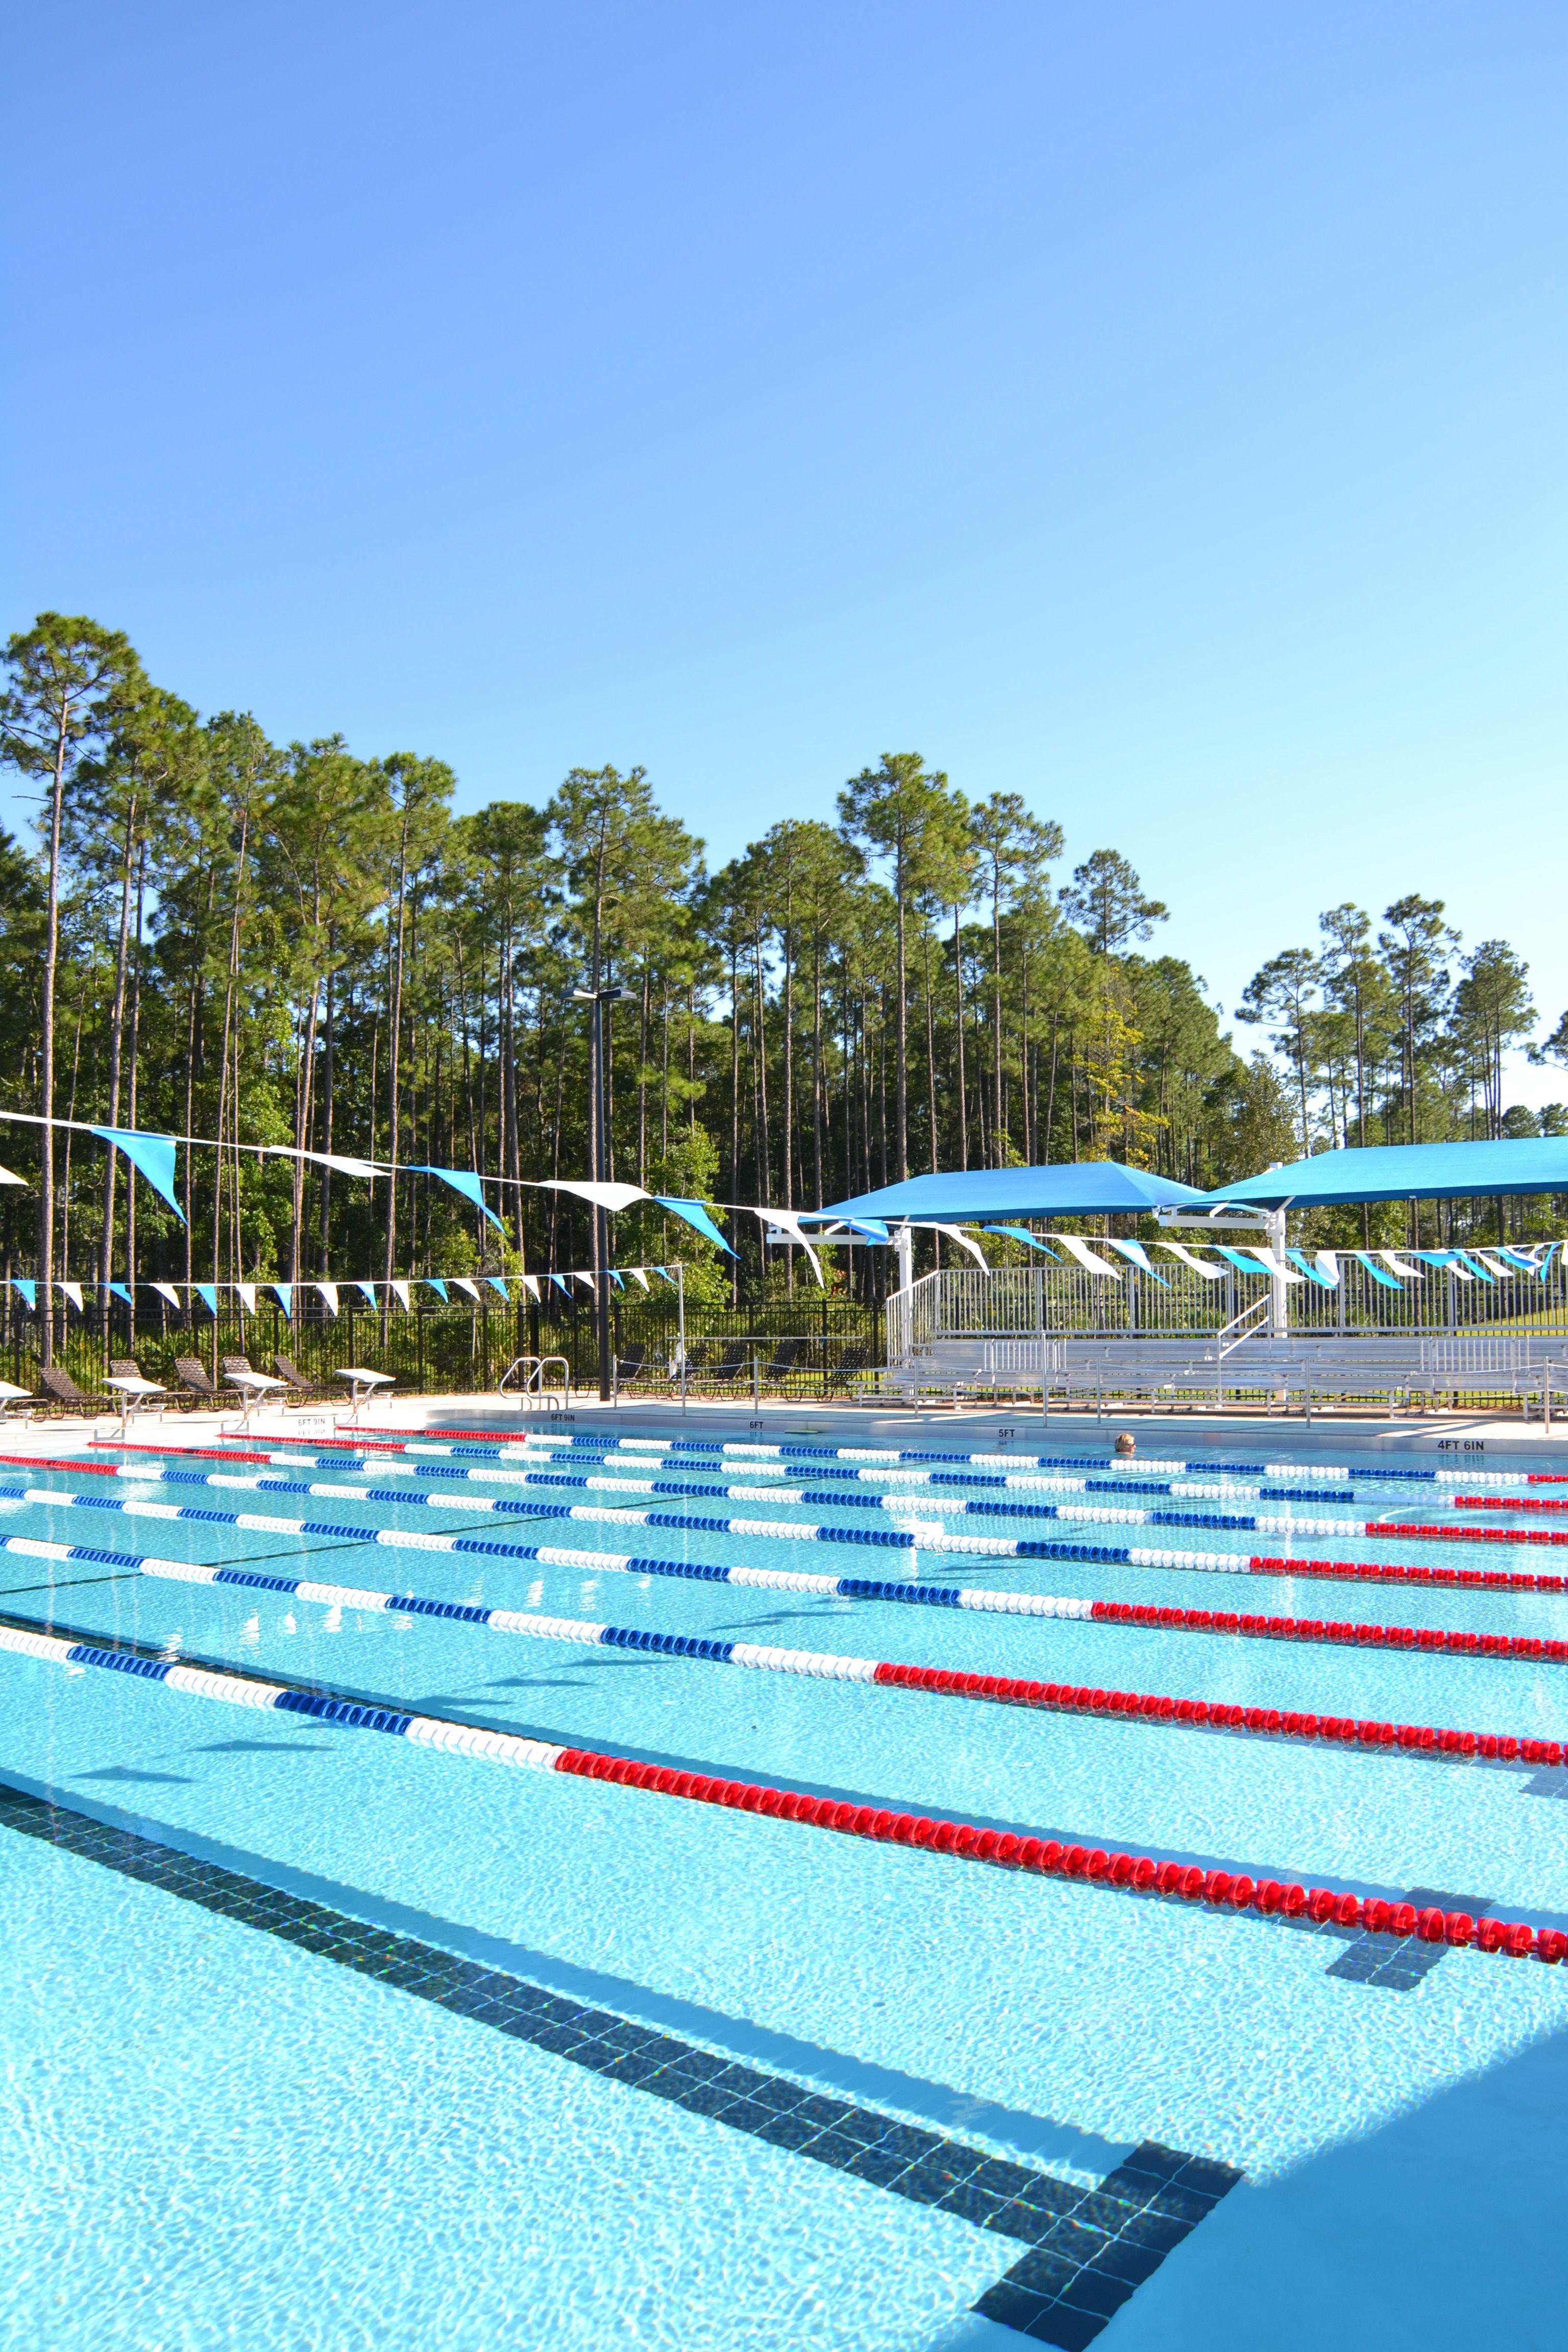 Pin By Hannah On Swim Team In 2021 Swim Club Splash Water Park Juniors Swim